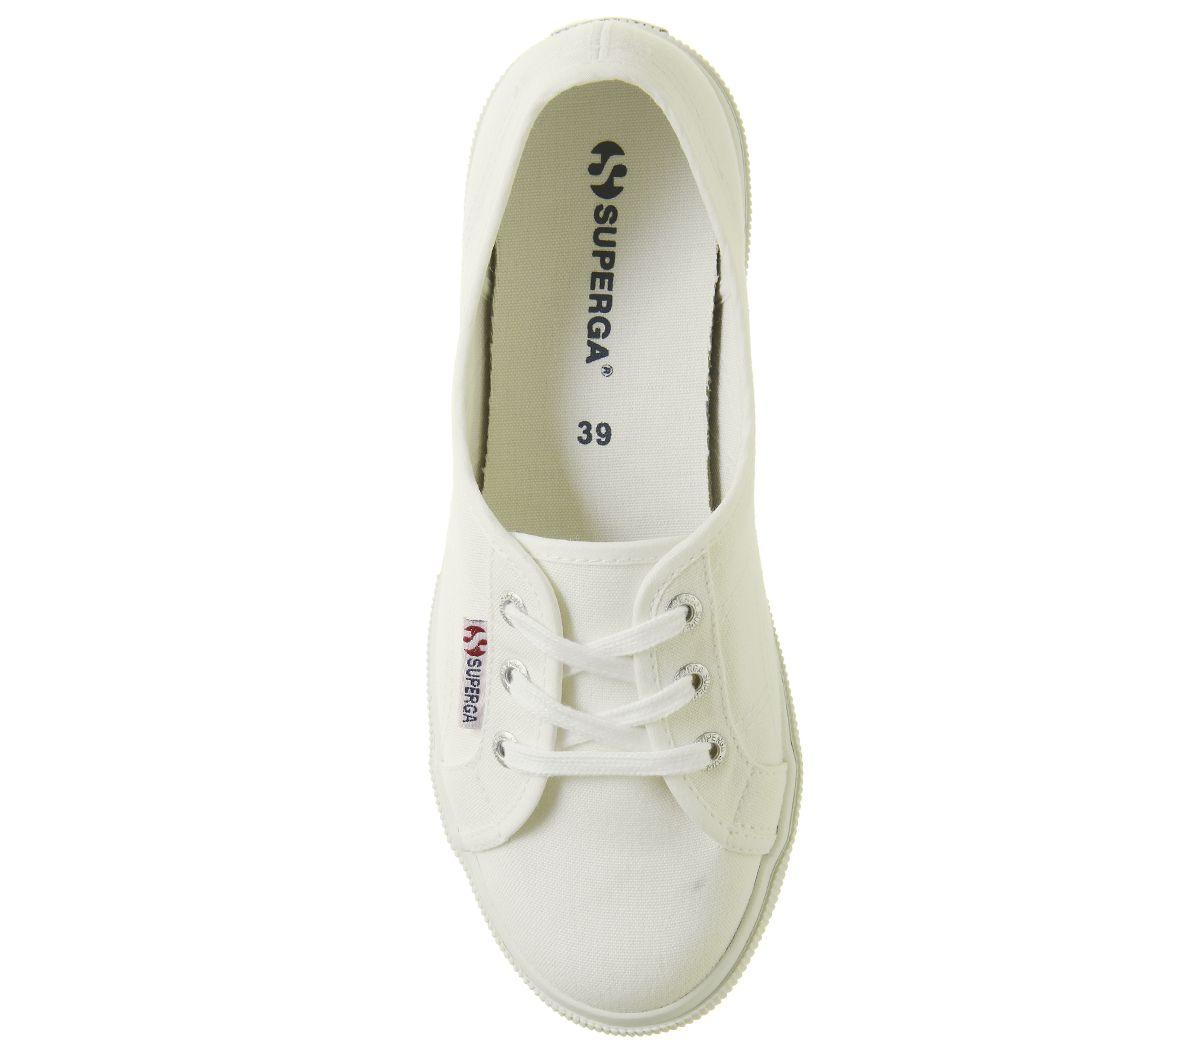 Zapatillas para mujer Superga 2211